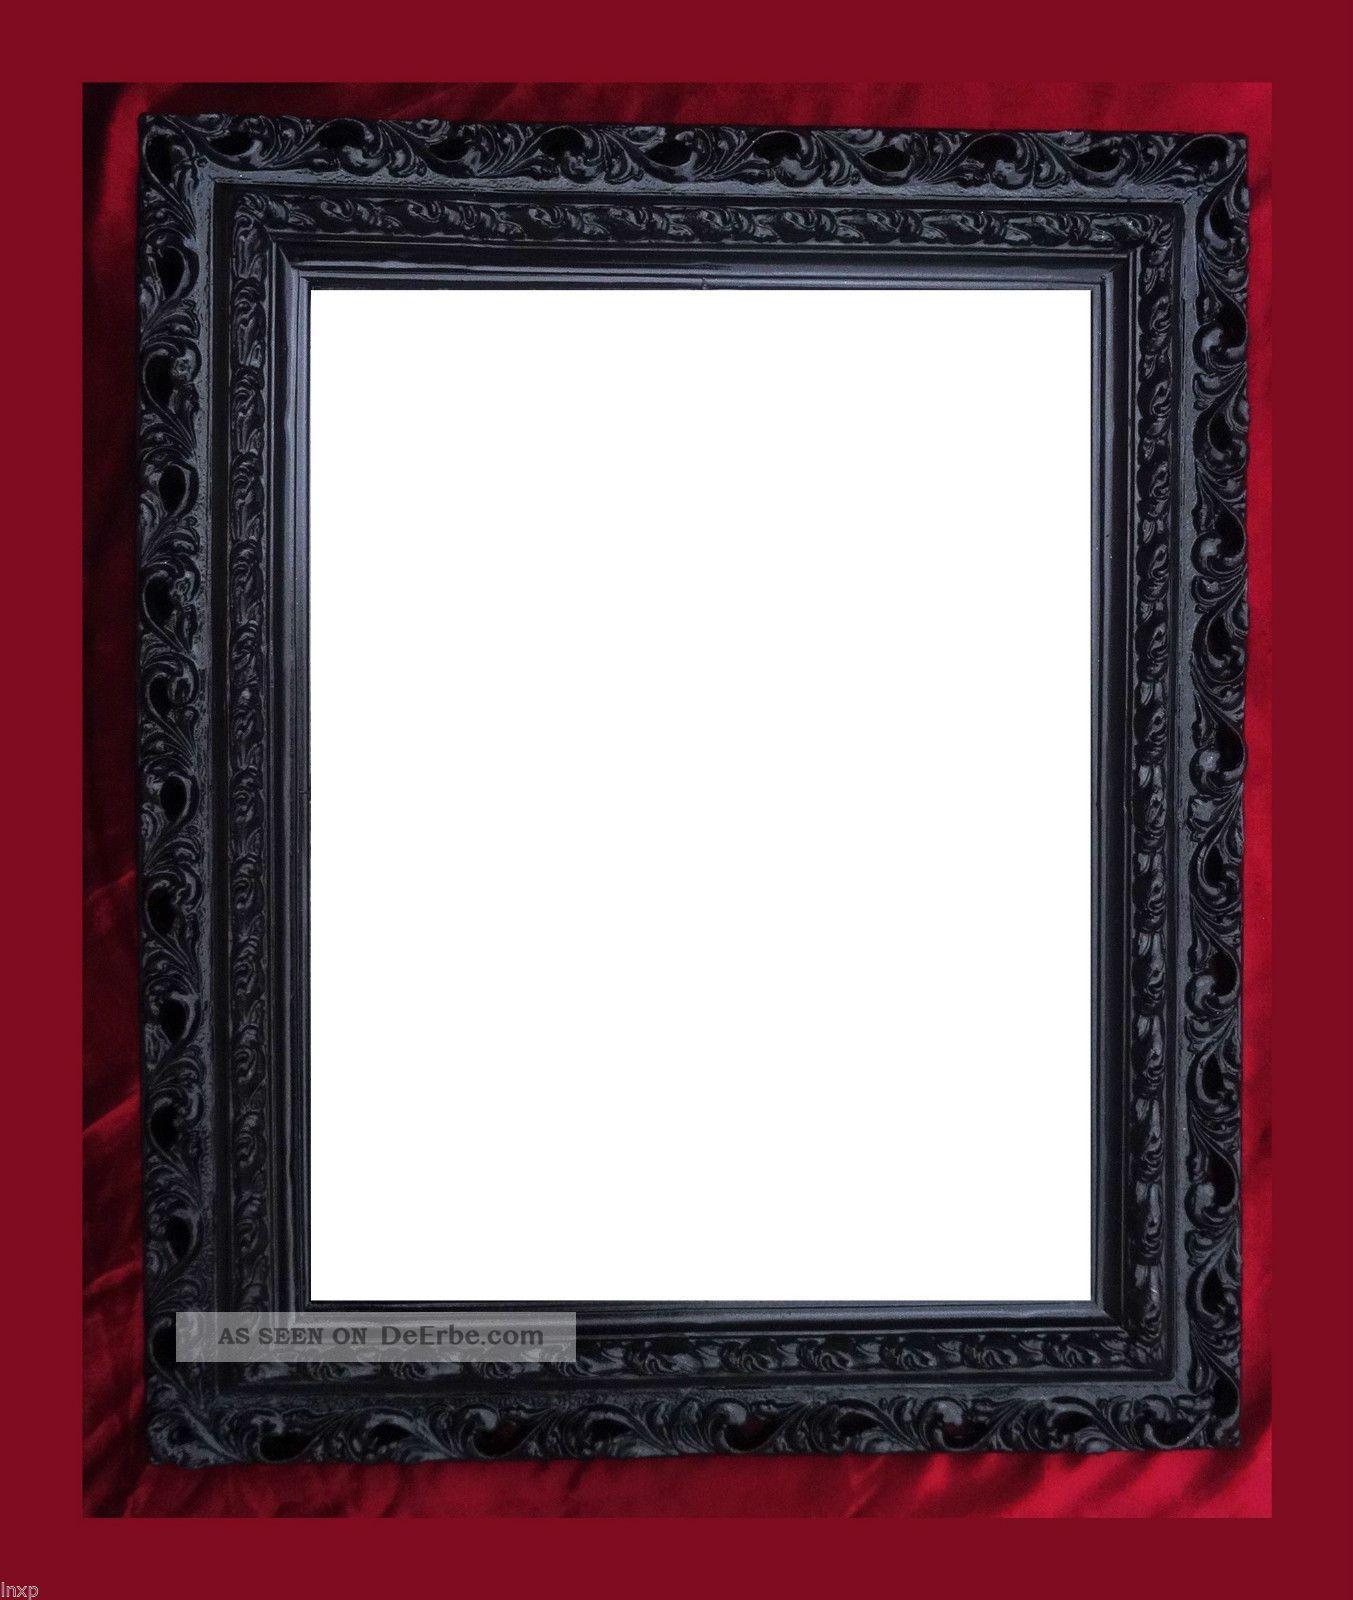 wandspiegel 43x36 spiegel barock rechteckig schwarz bilderrahmen arabesco 3. Black Bedroom Furniture Sets. Home Design Ideas